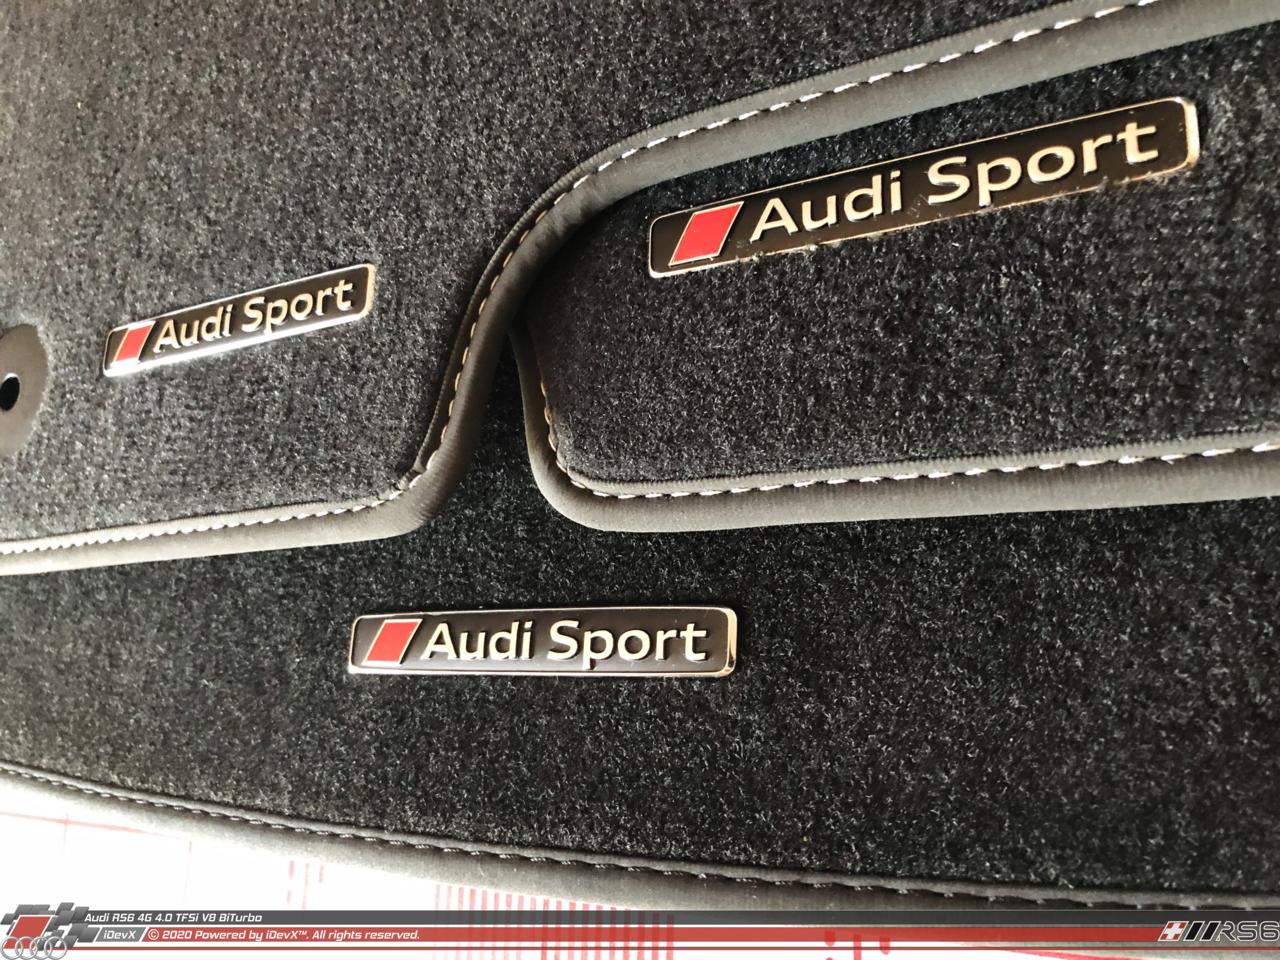 15_08.2019_Audi-RS6_iDevX_018.png